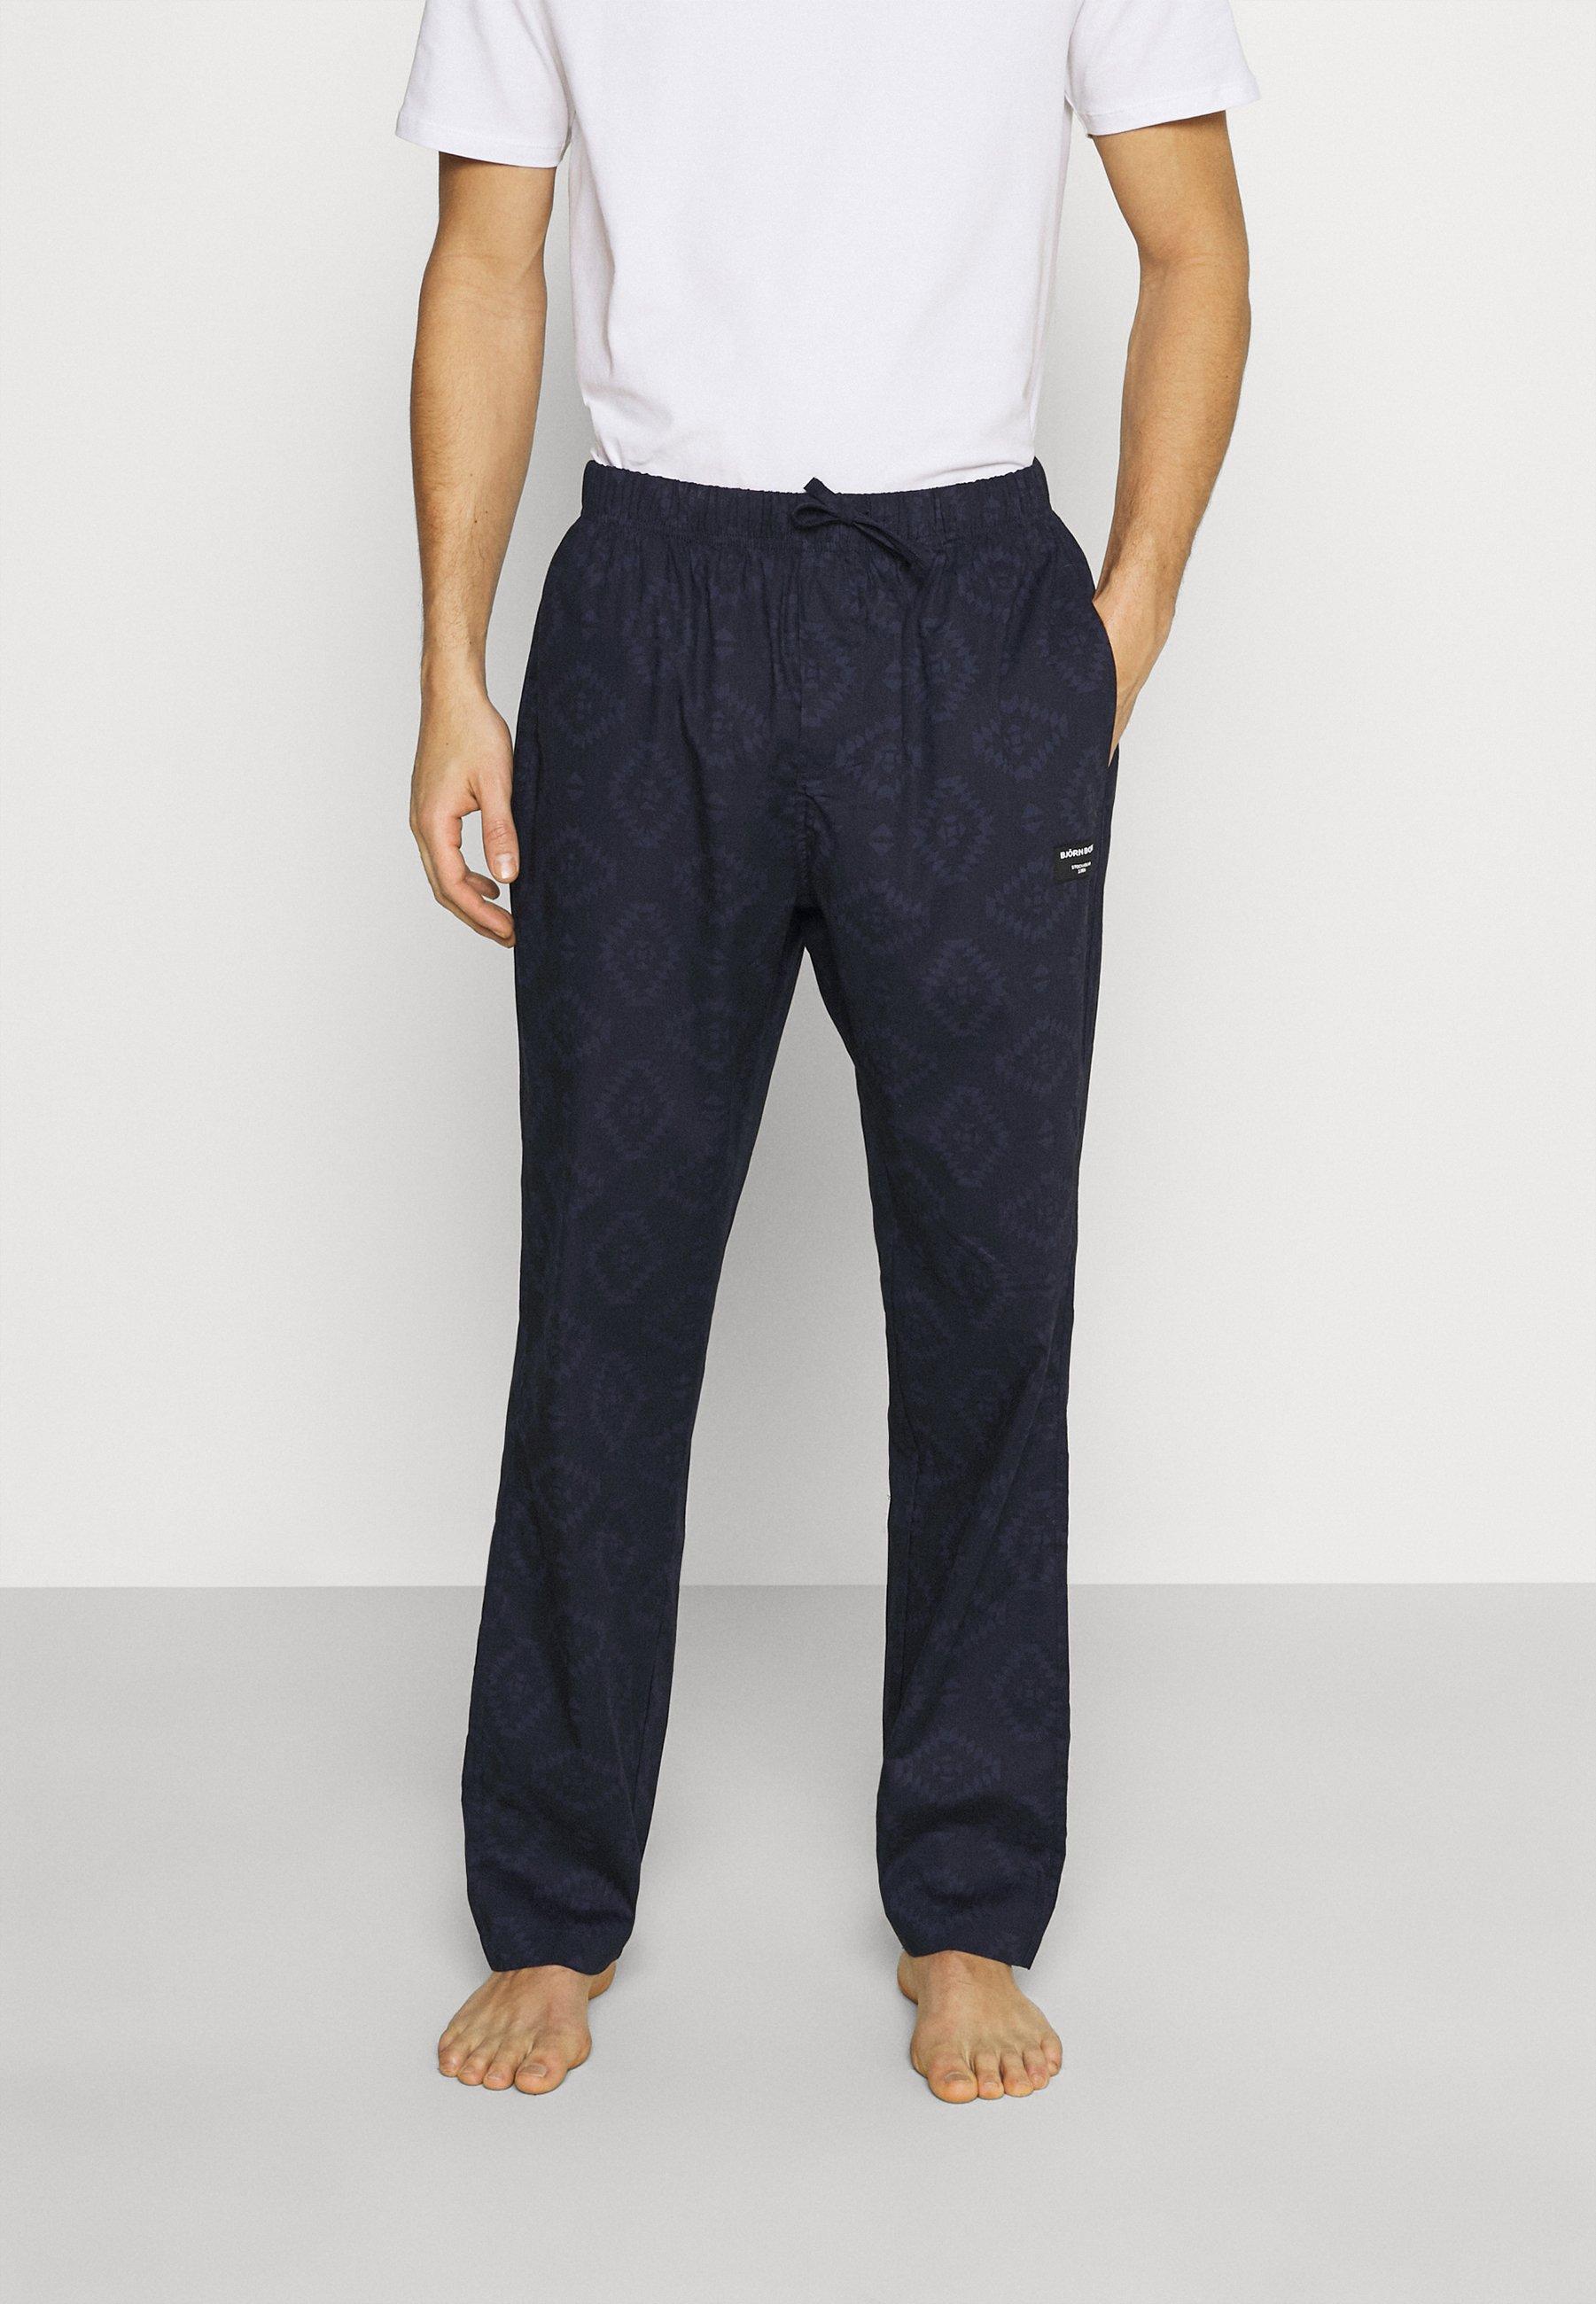 Homme TIERRA PYJAMA PANT PERCY - Bas de pyjama